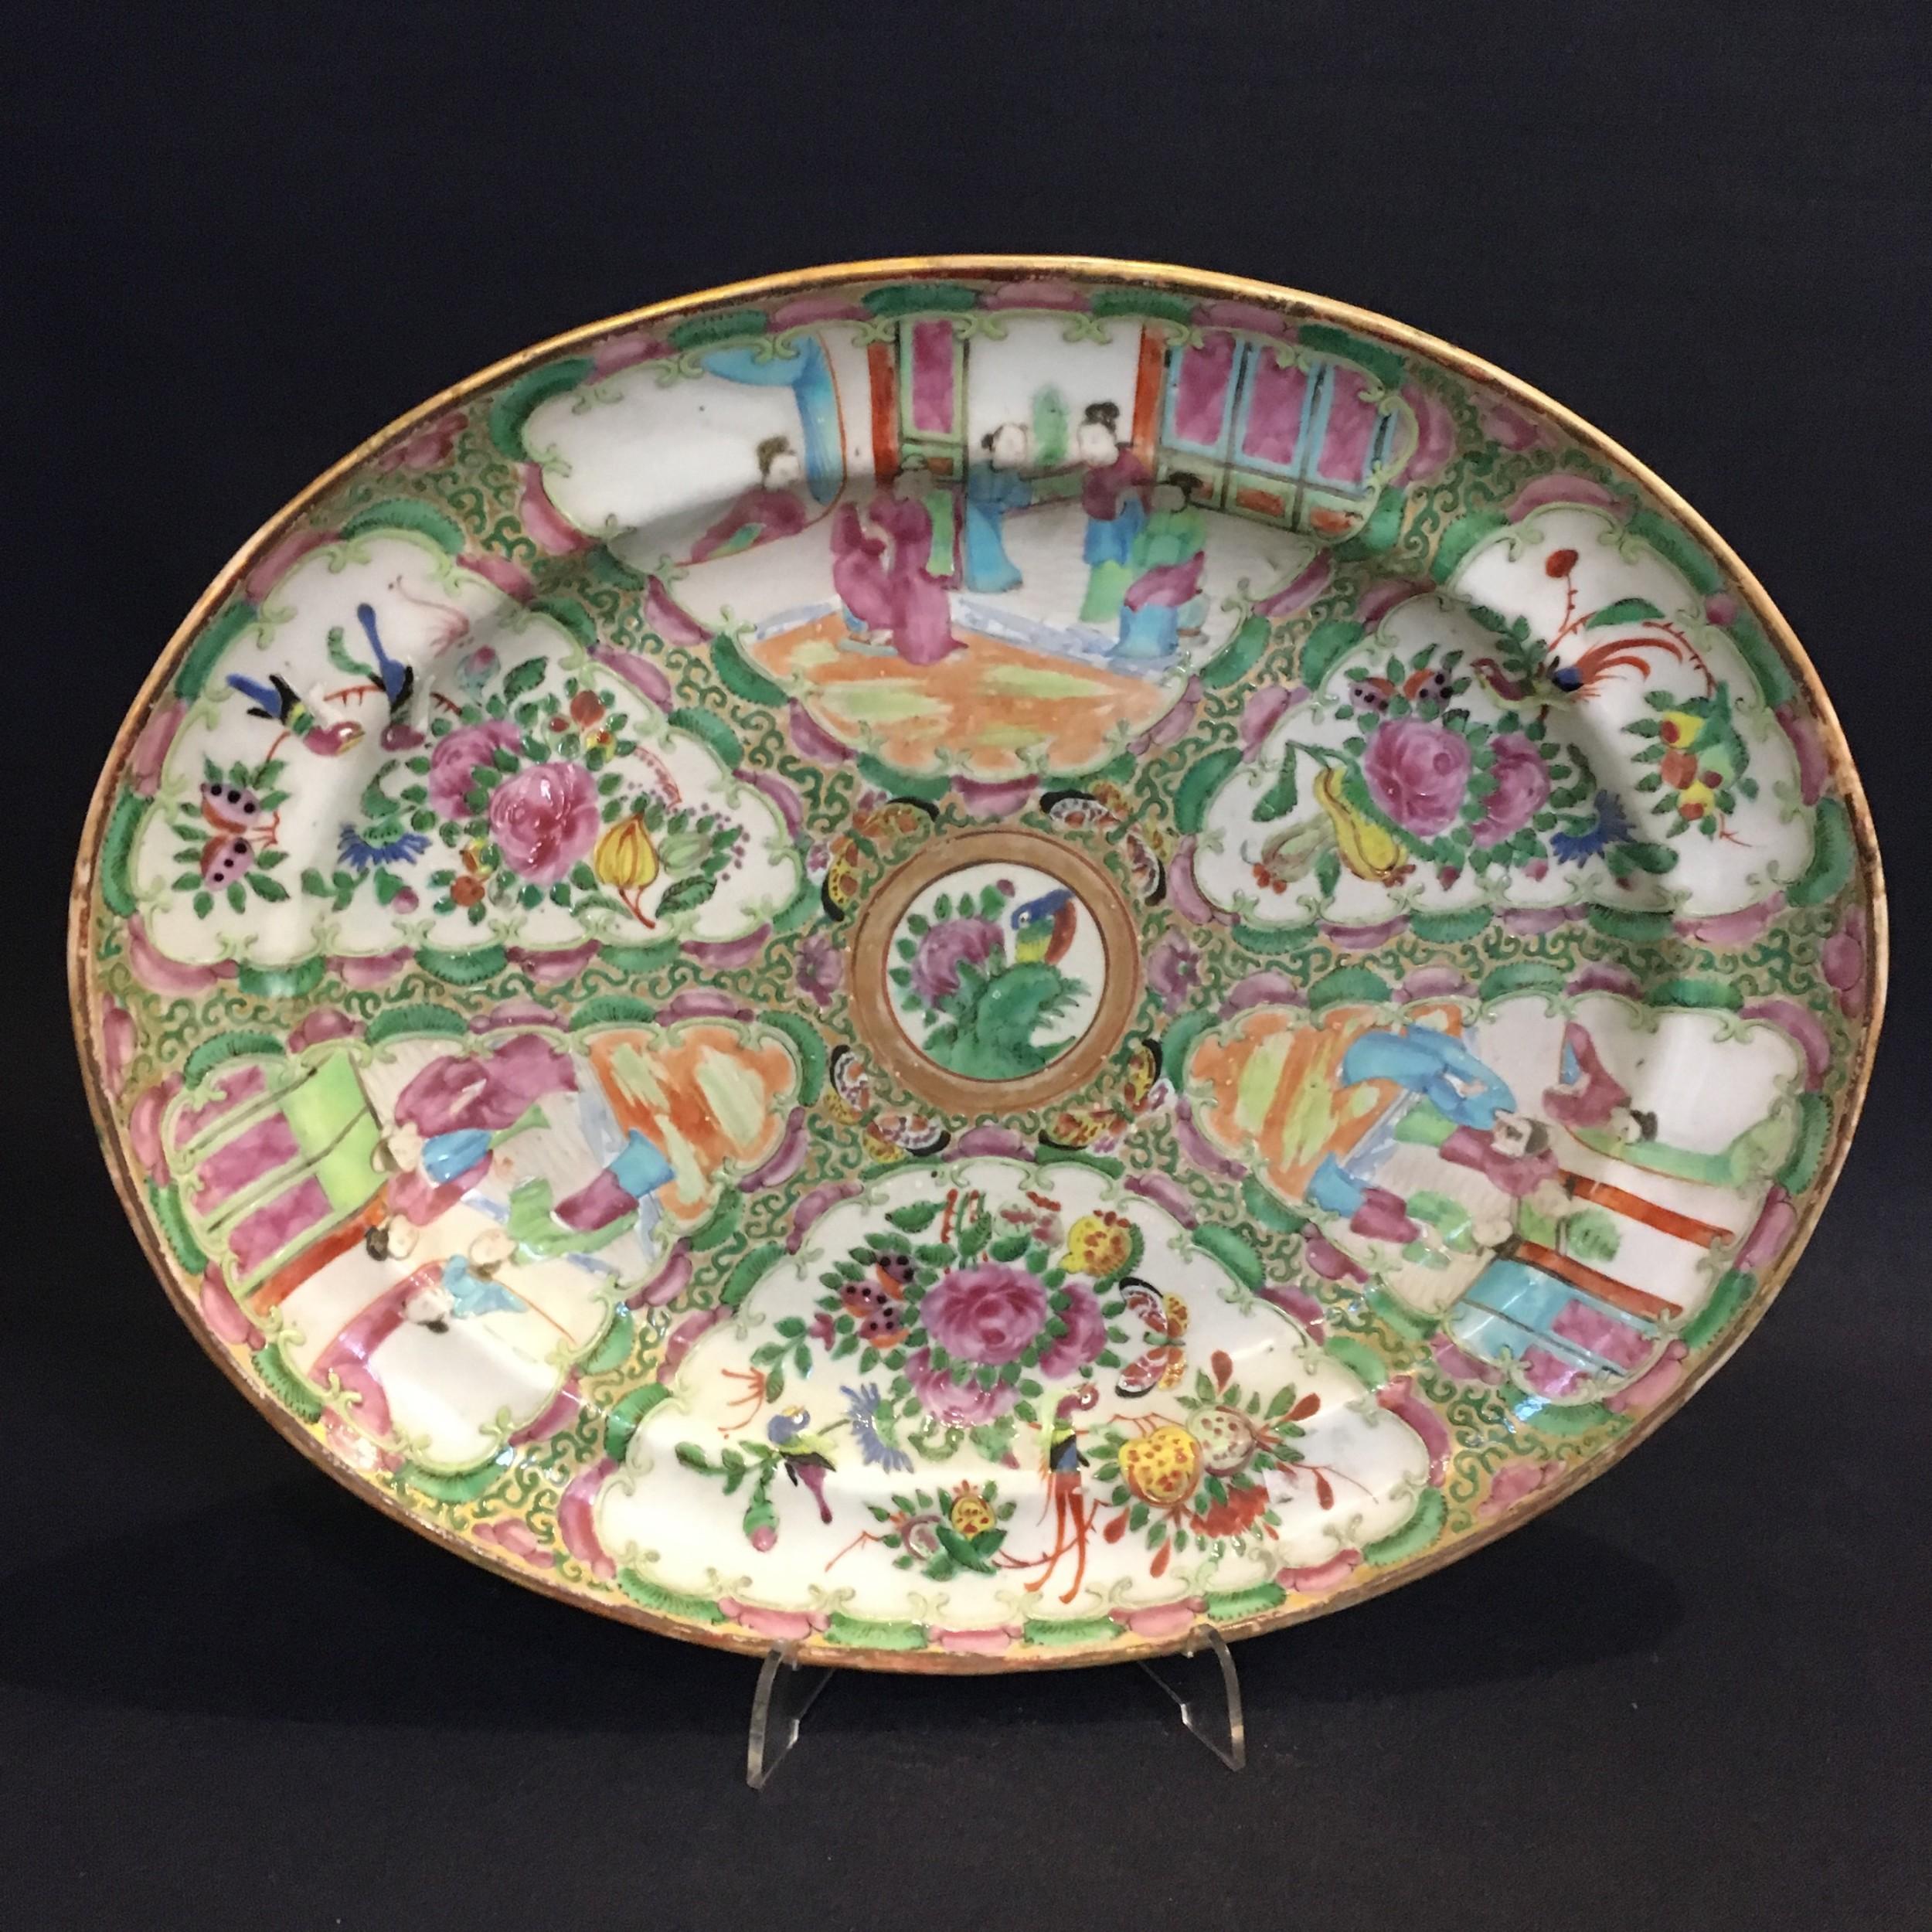 19th century cantonese oval platter